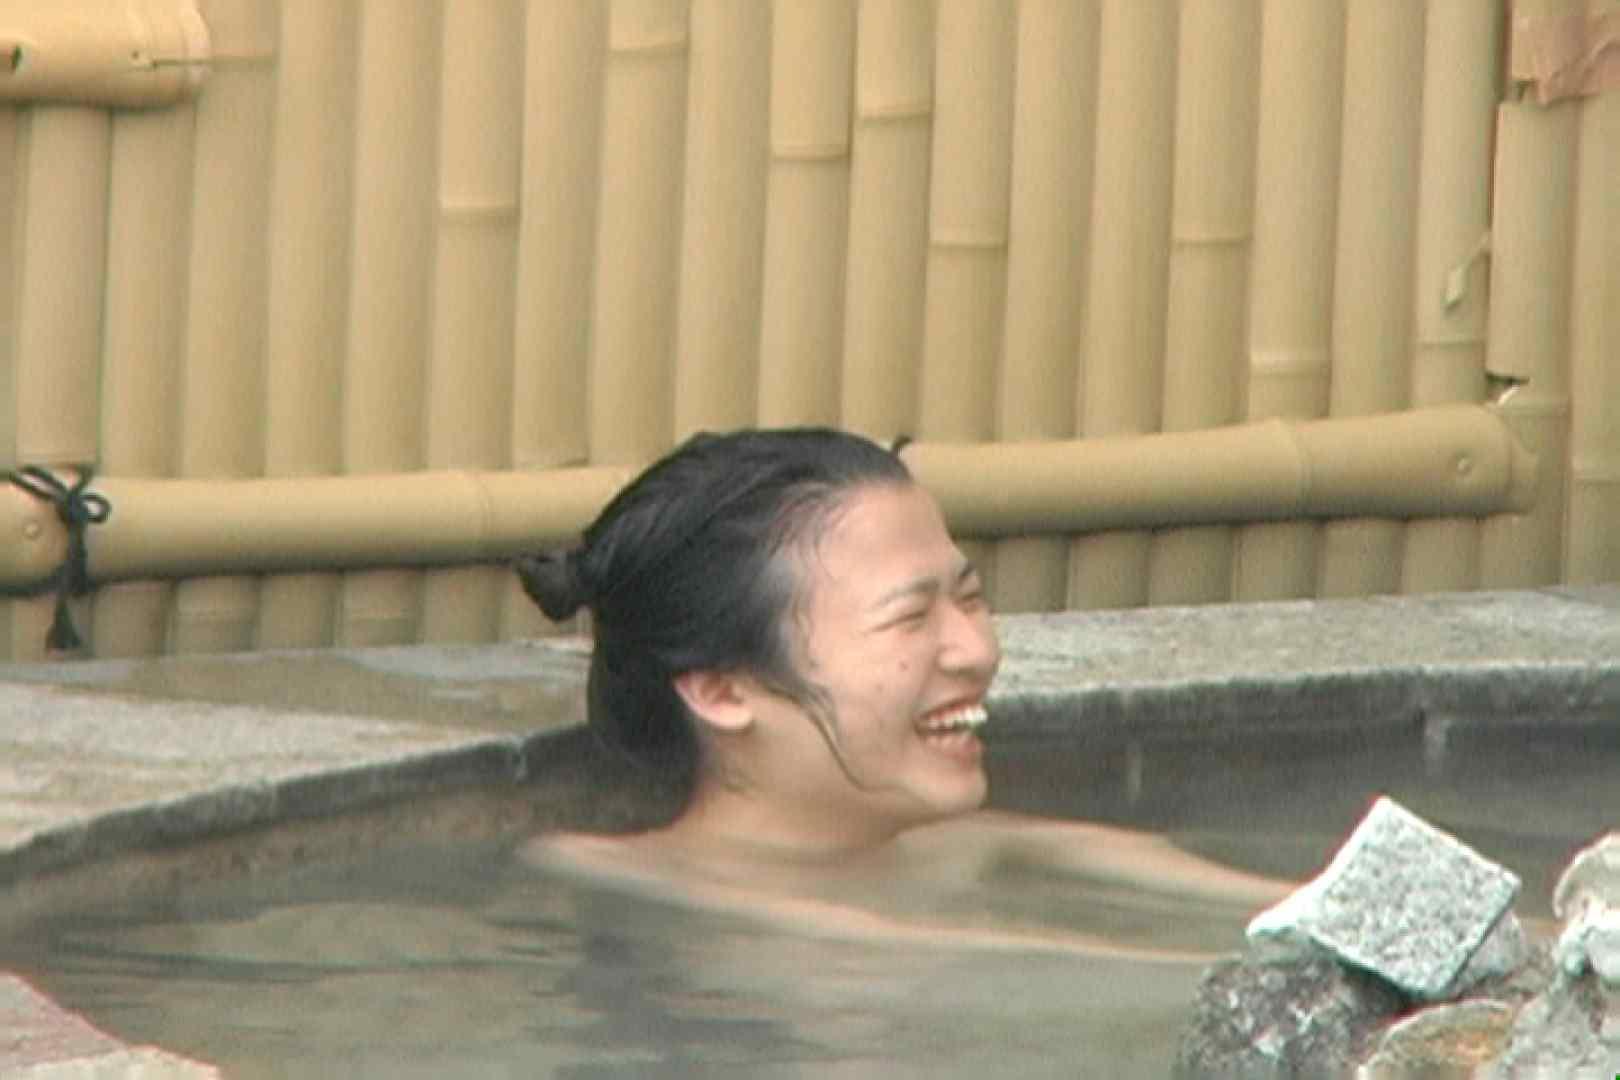 Aquaな露天風呂Vol.647 0   0  58連発 25